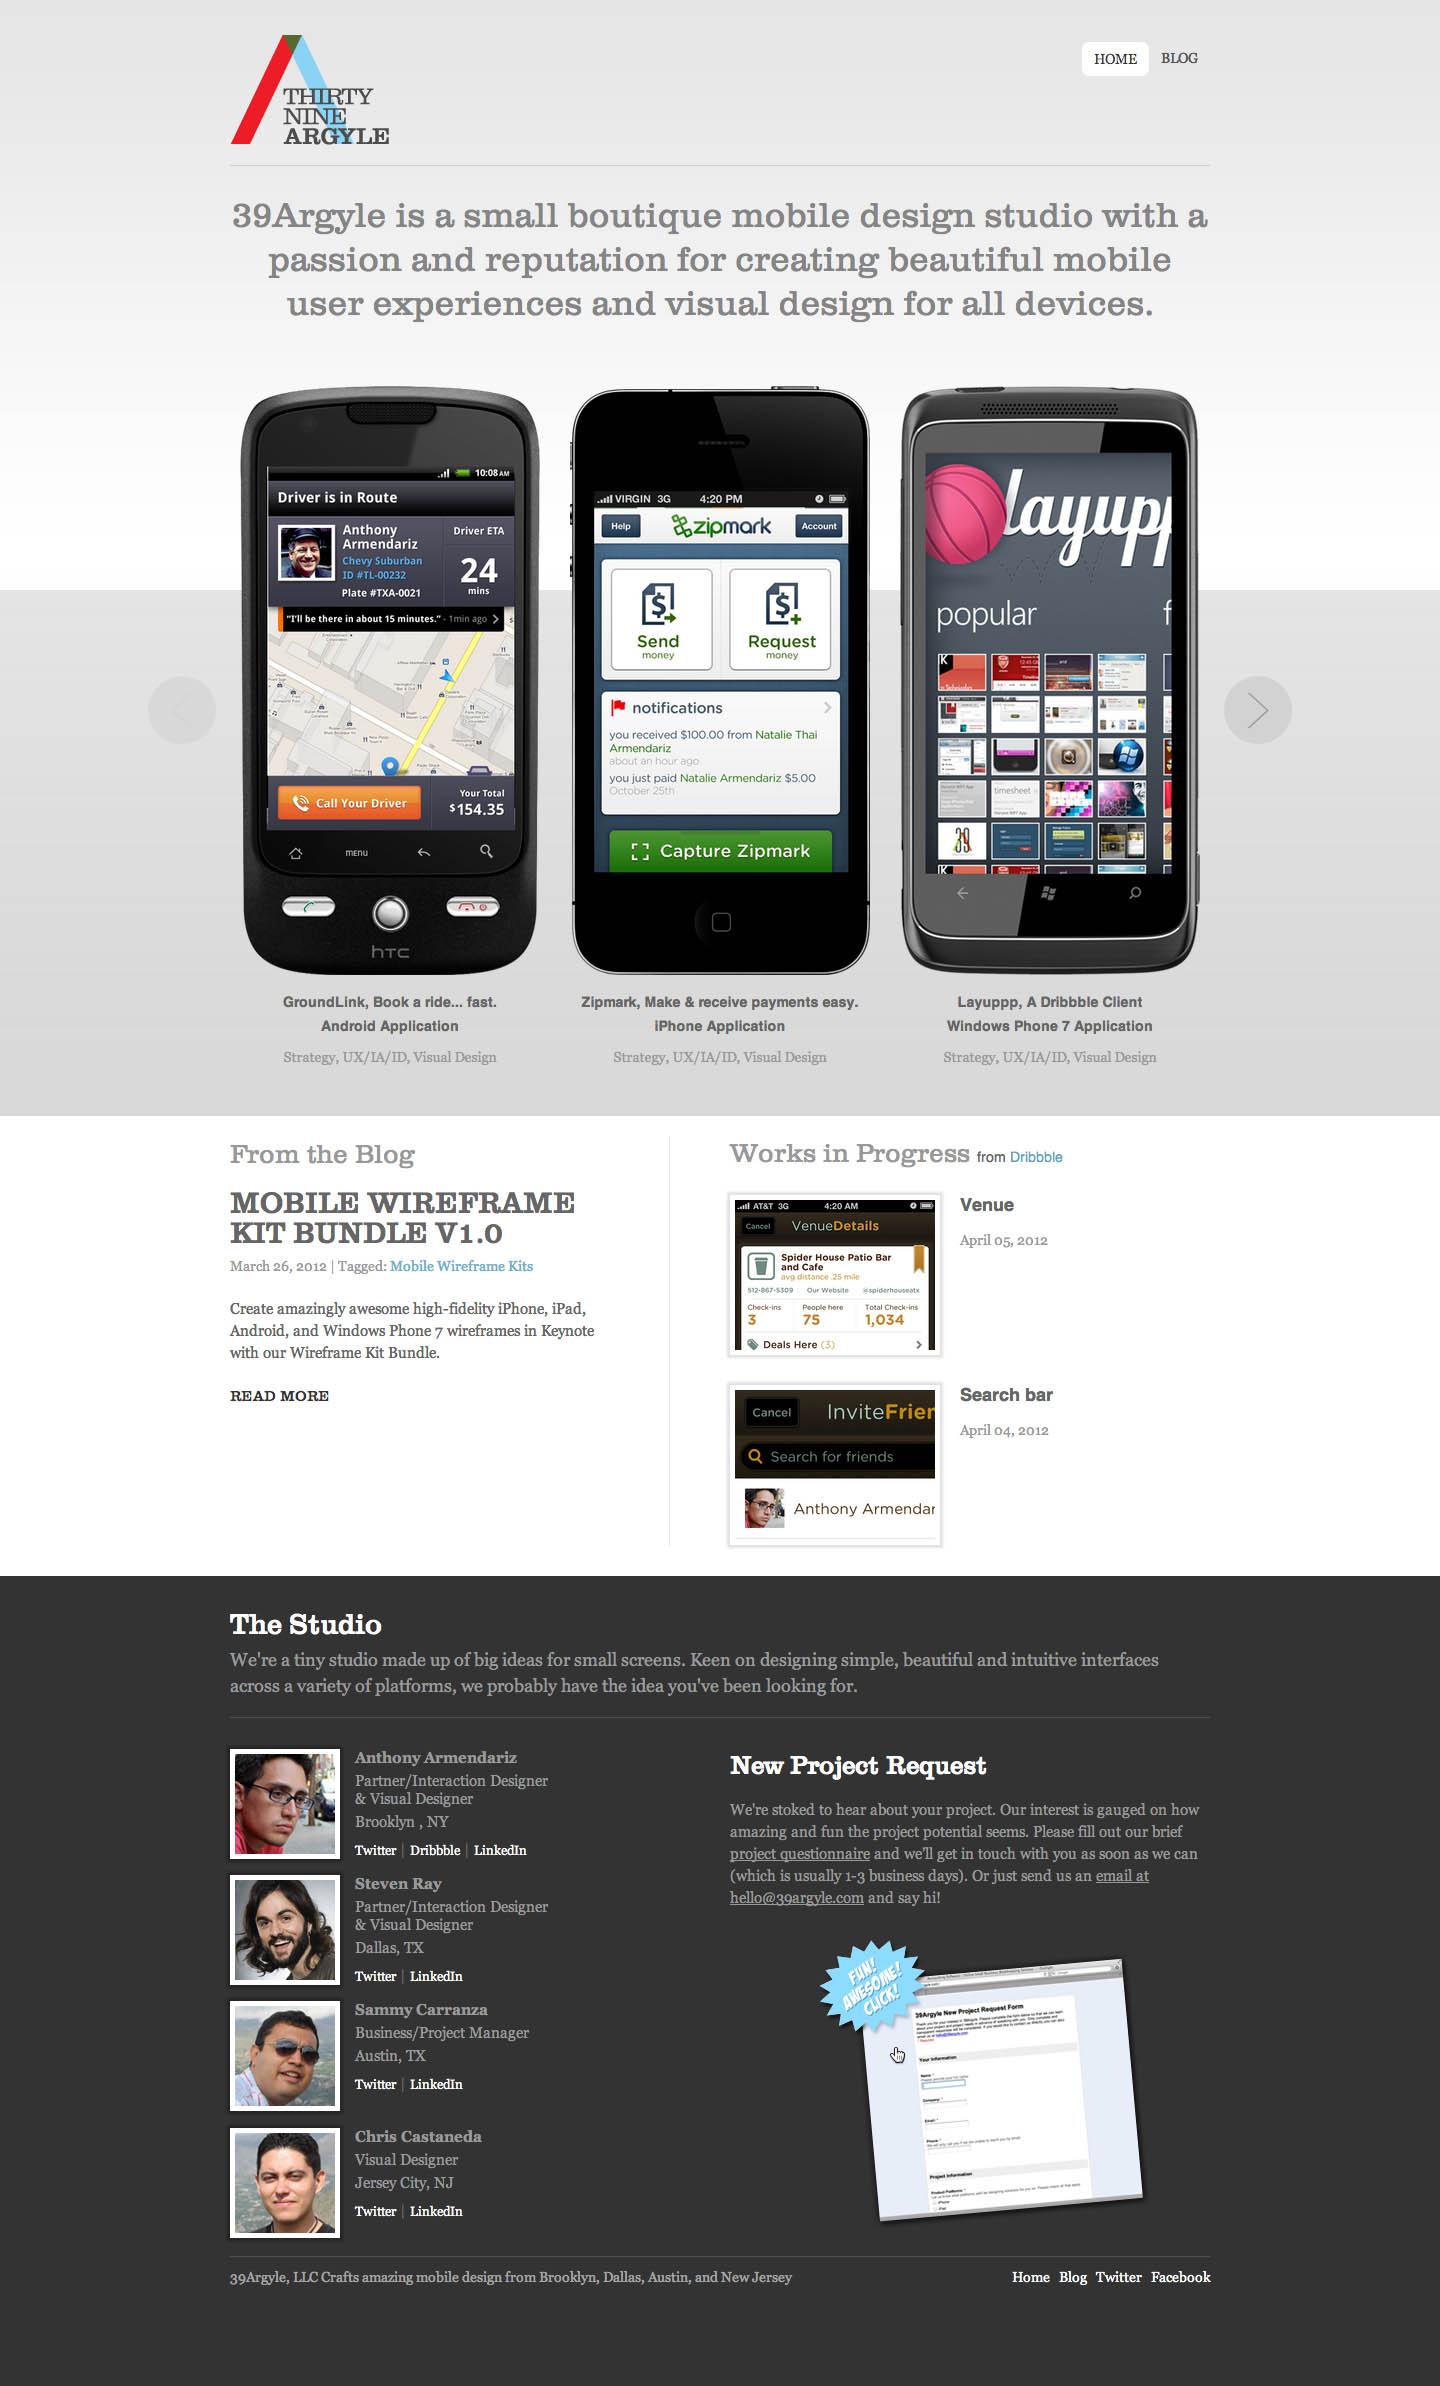 39Argyle Website Screenshot